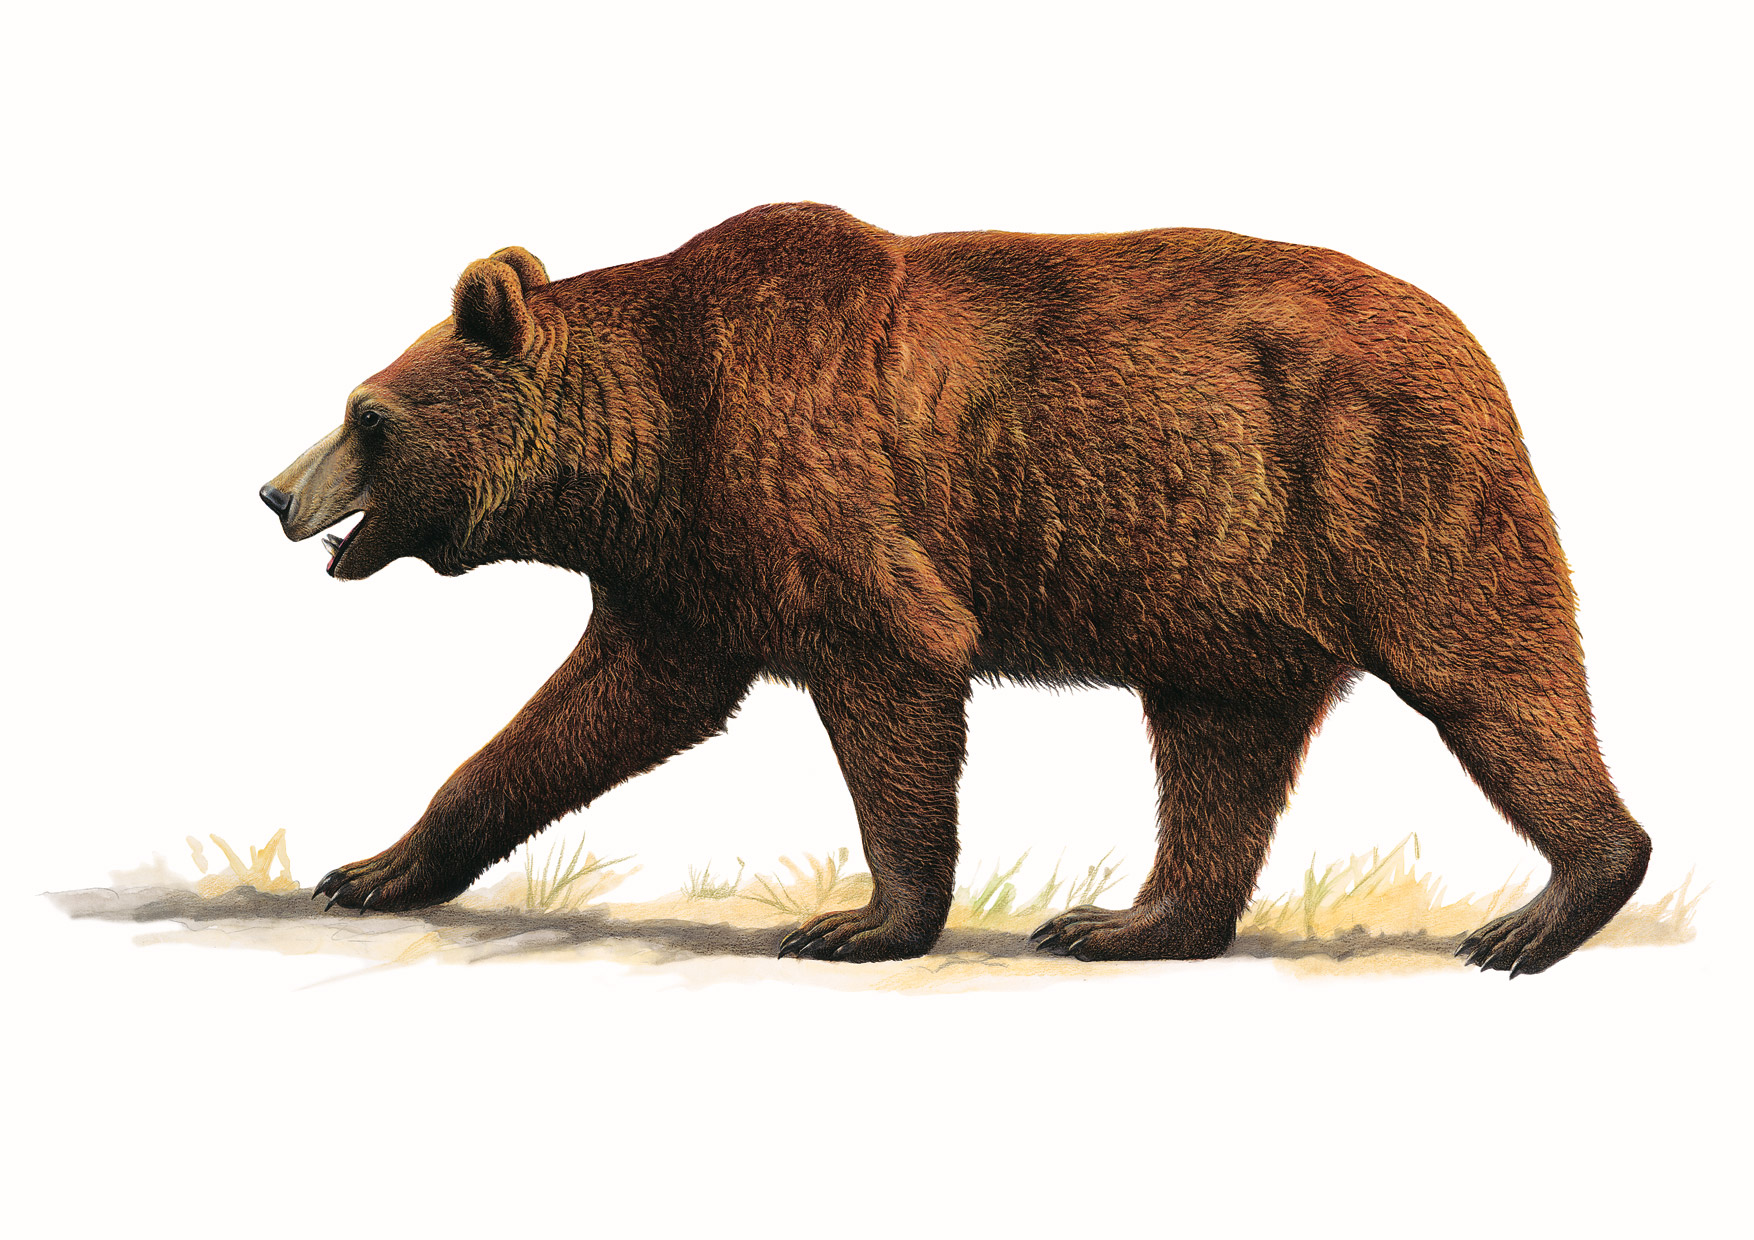 https://www.nuggetsfactory.com/EURO/mammifere/Ursus%20spelaeus/cave-bear%202.jpg